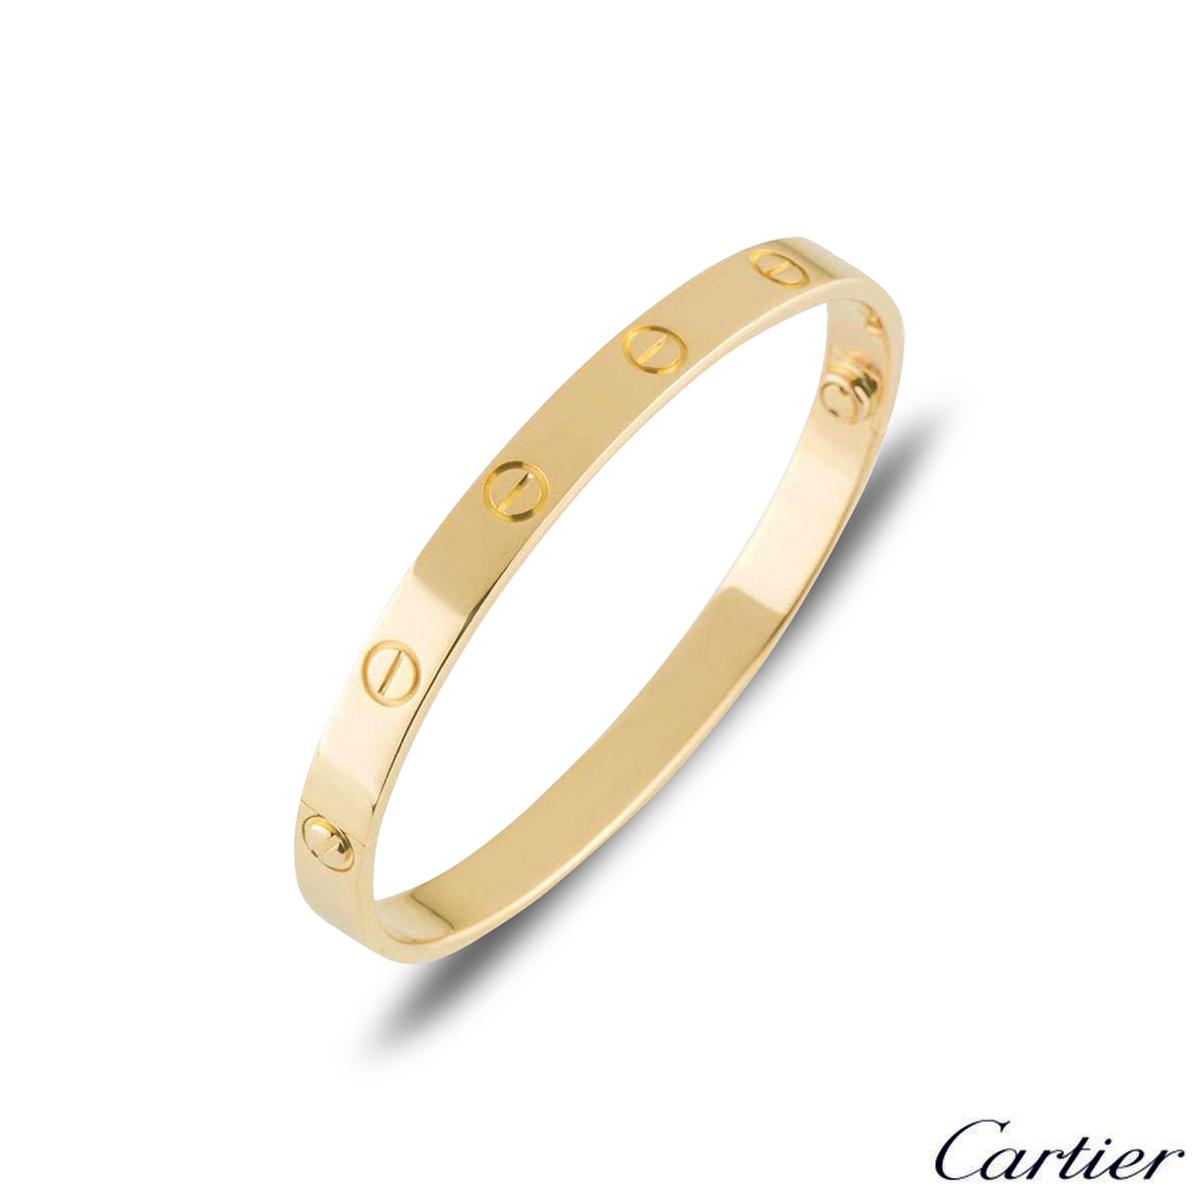 Cartier Yellow Gold Plain Love Bracelet Size 17 B6035517